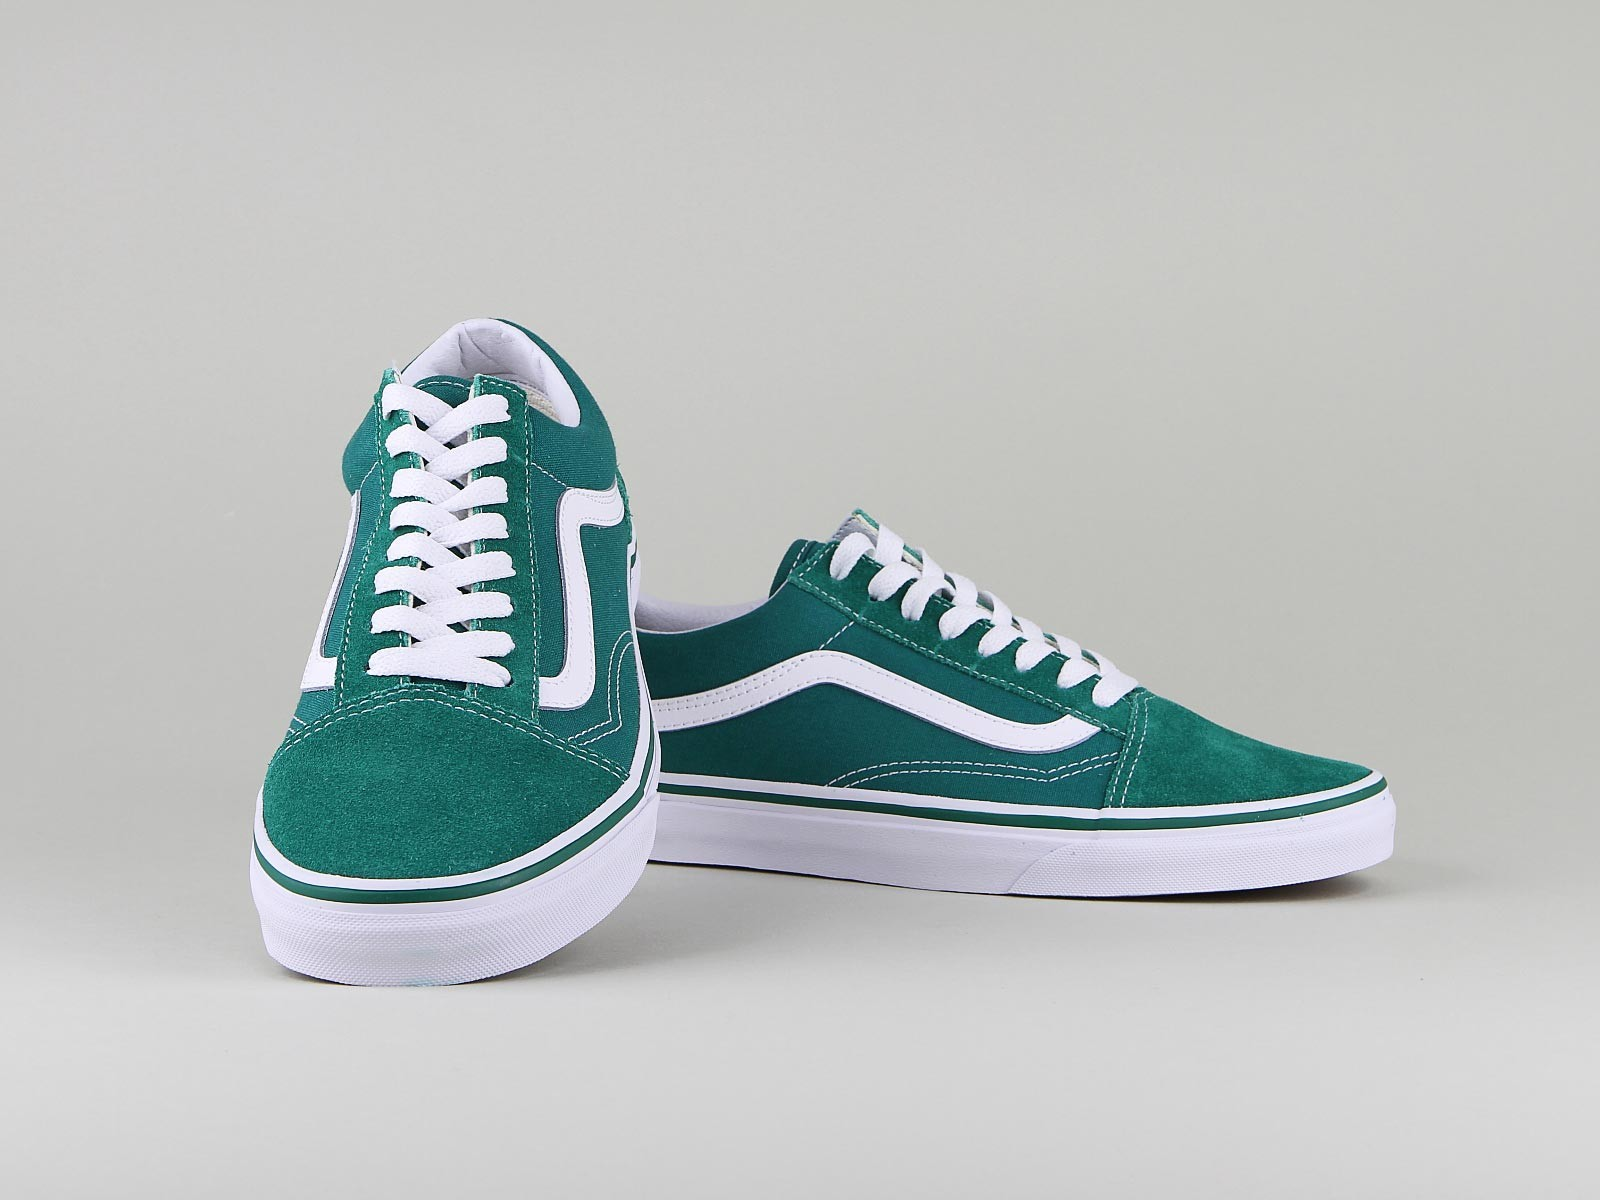 chaussure vans verte